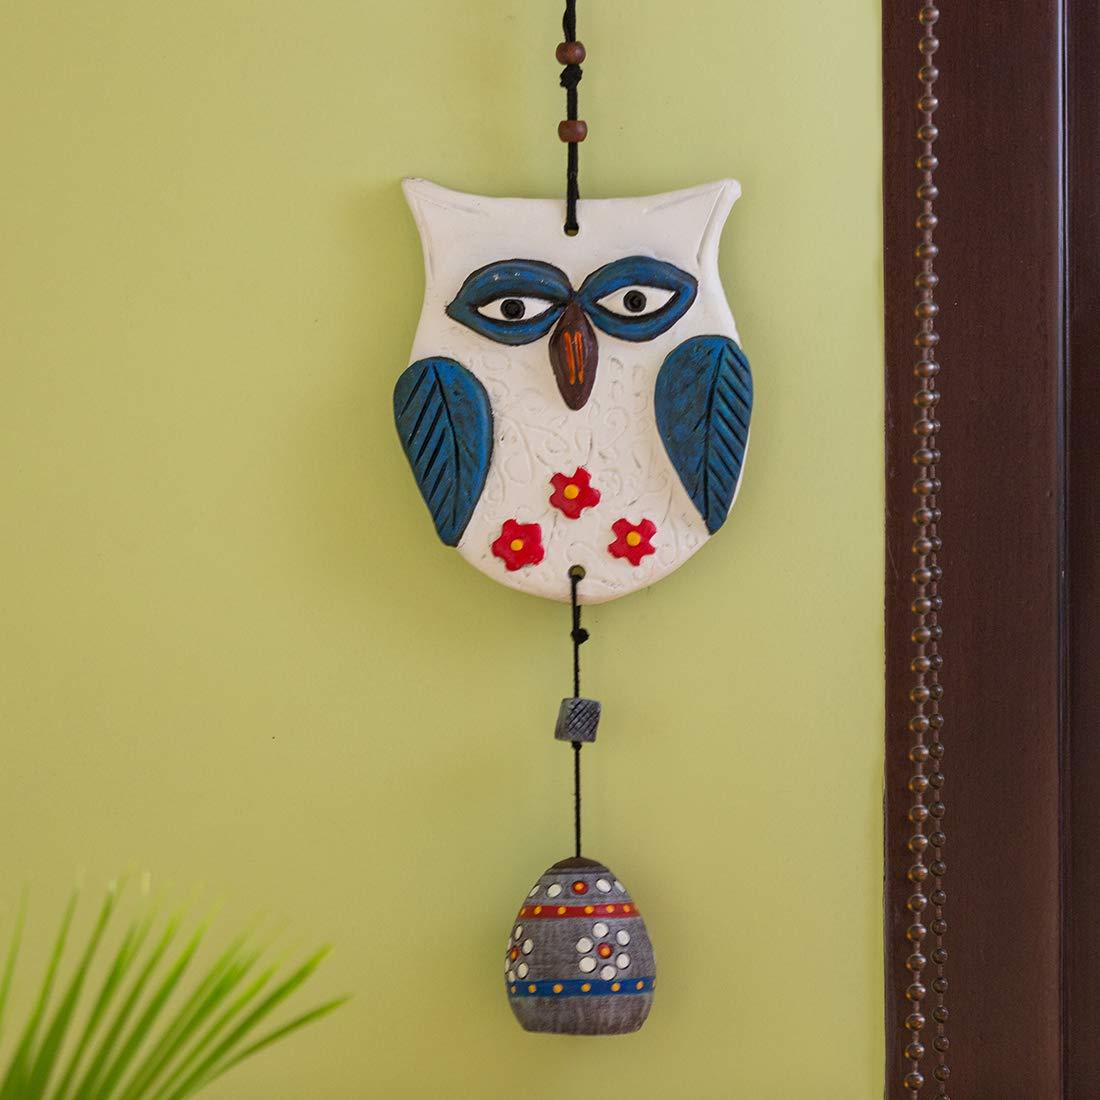 Buy ExclusiveLane Owl Handmade and Hand-Painted Garden Decorative